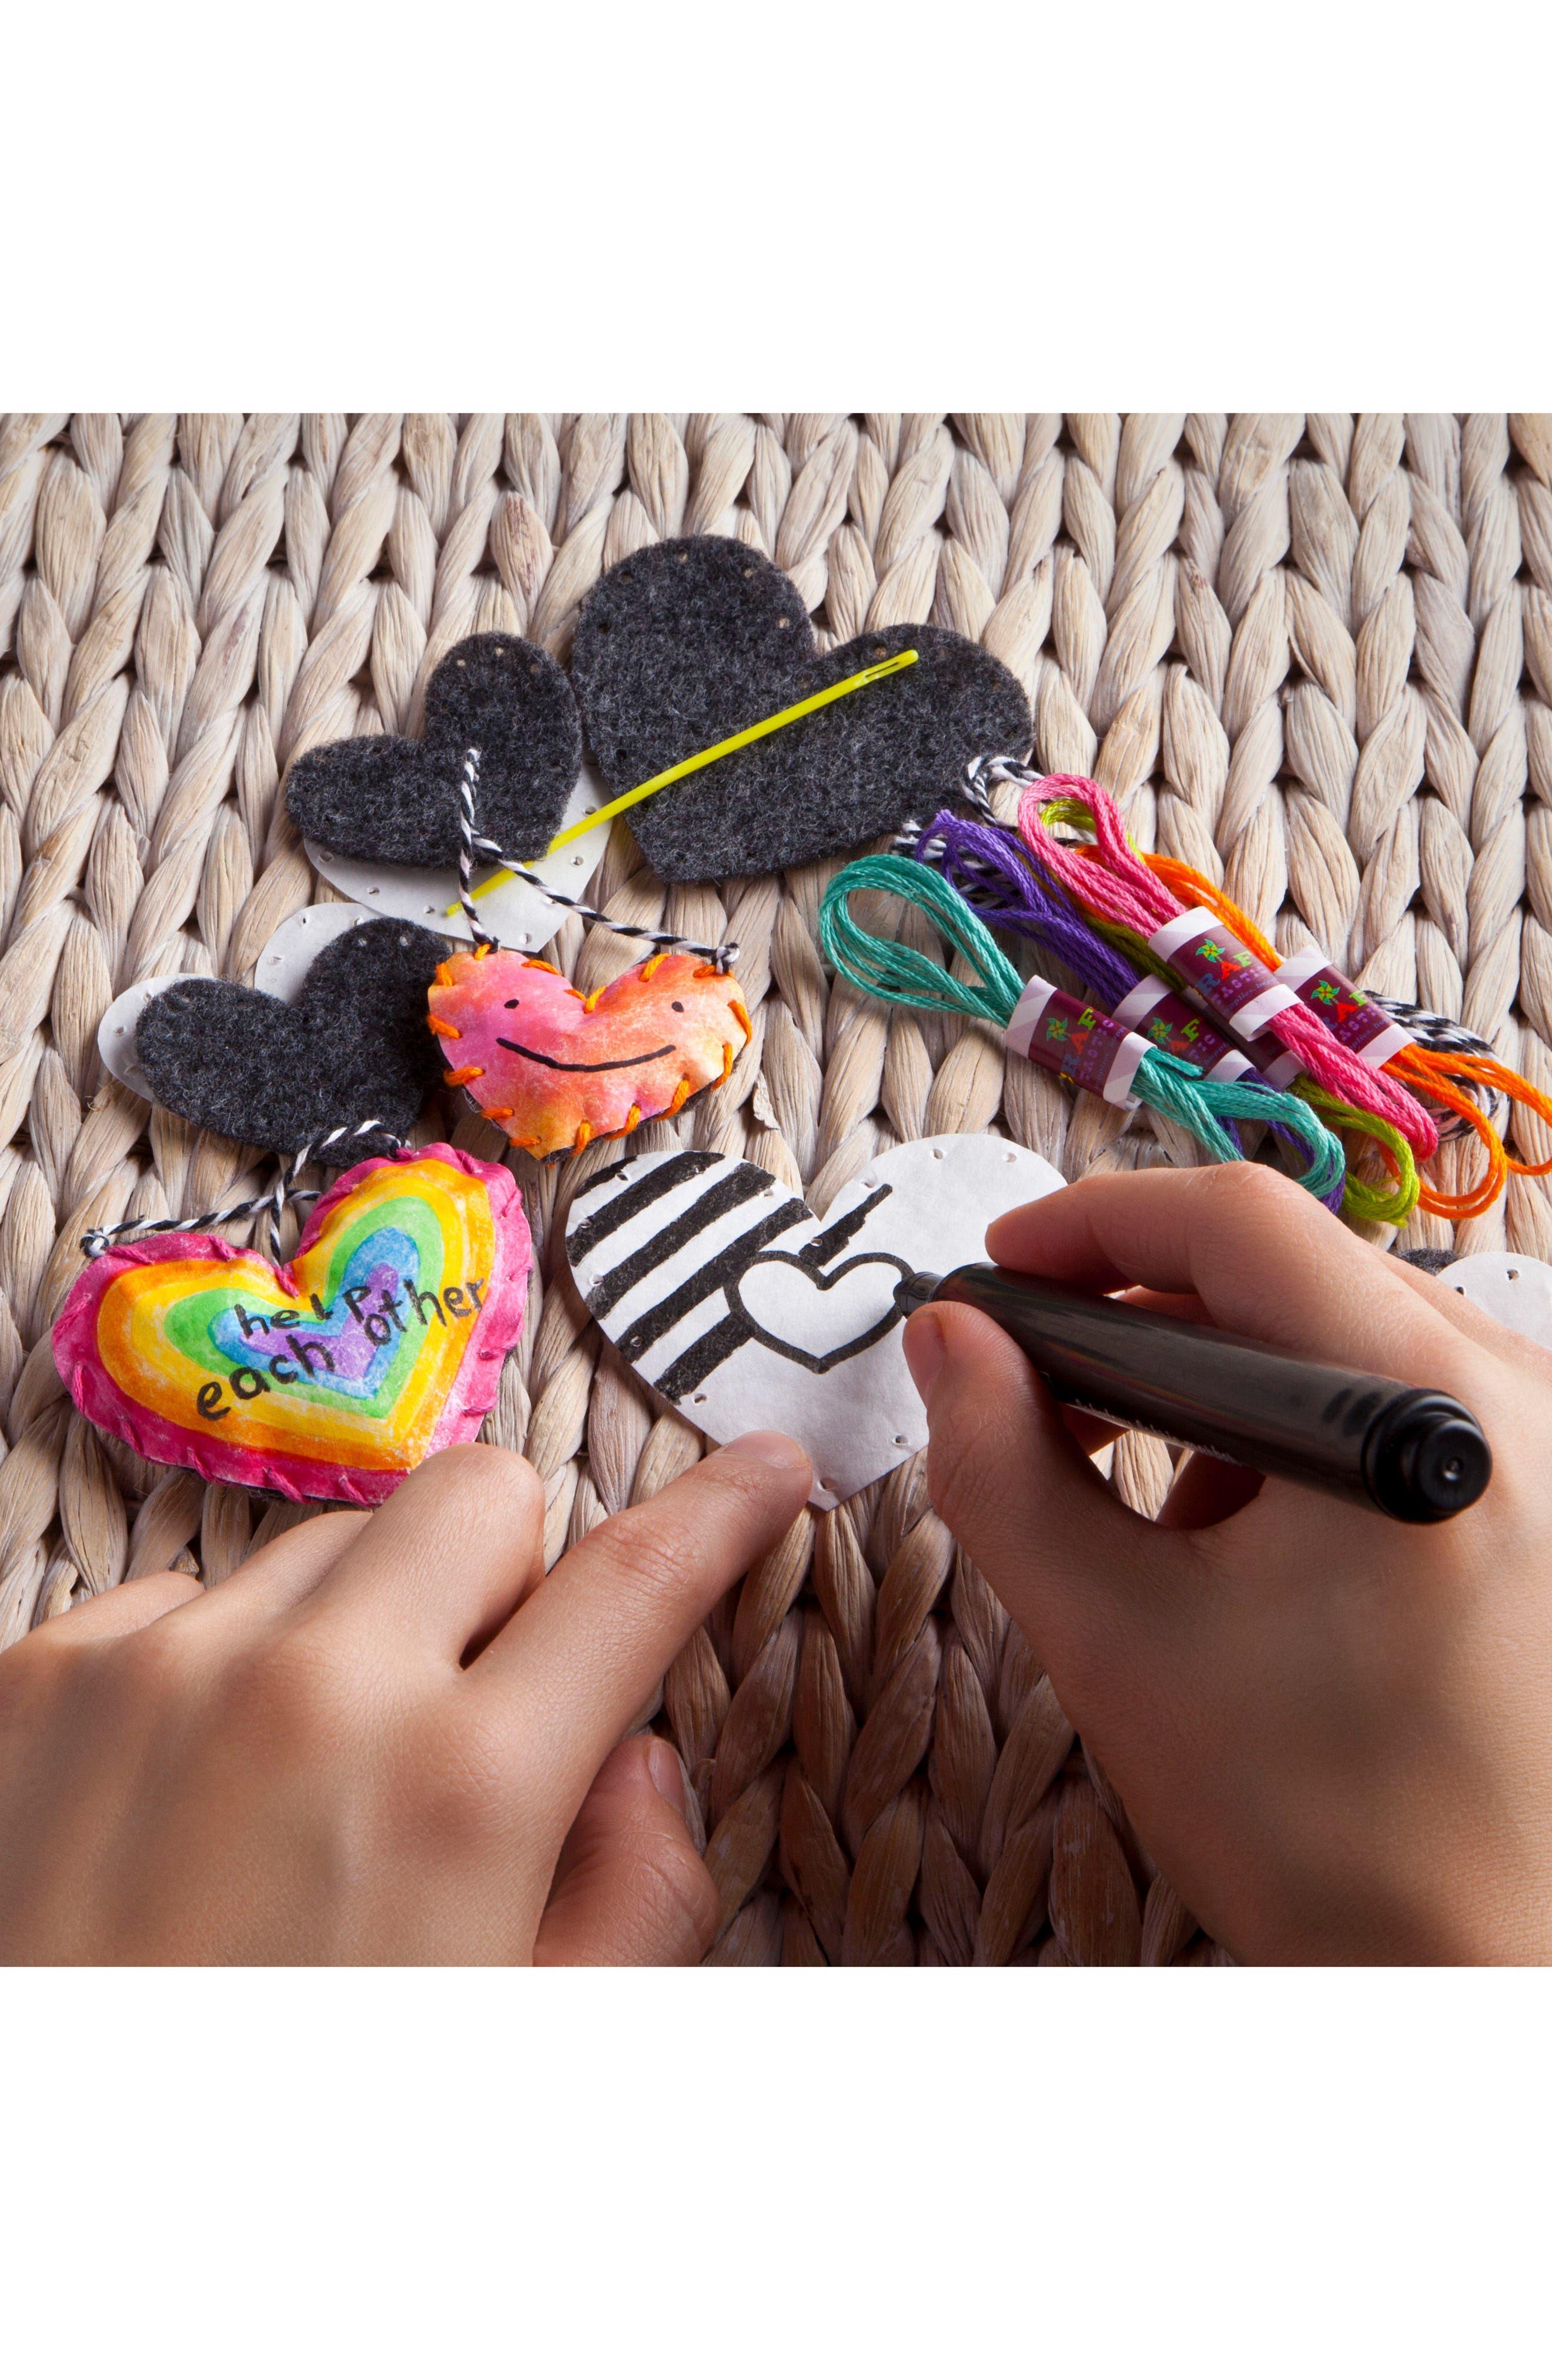 Make & Give Giving Hearts Craft Kit,                             Alternate thumbnail 3, color,                             White